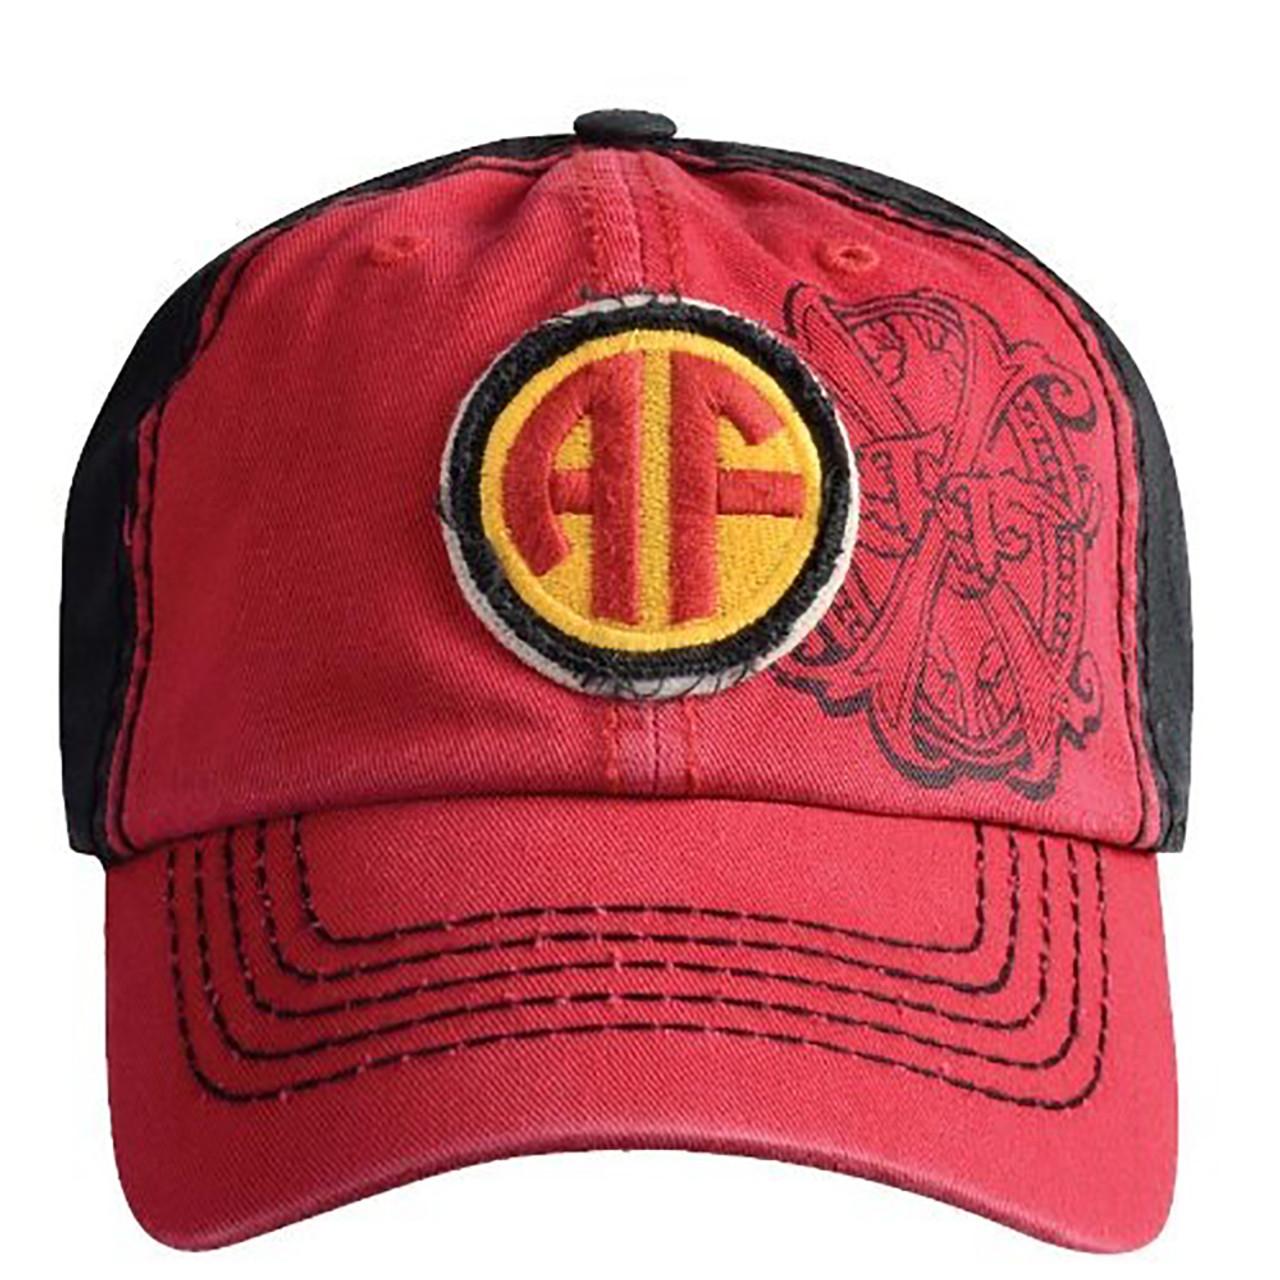 e6ba4898728 Arturo Fuente AF Opus X Logo Baseball Hat - Red and Black  20763.1529821336.jpg c 2 imbypass on